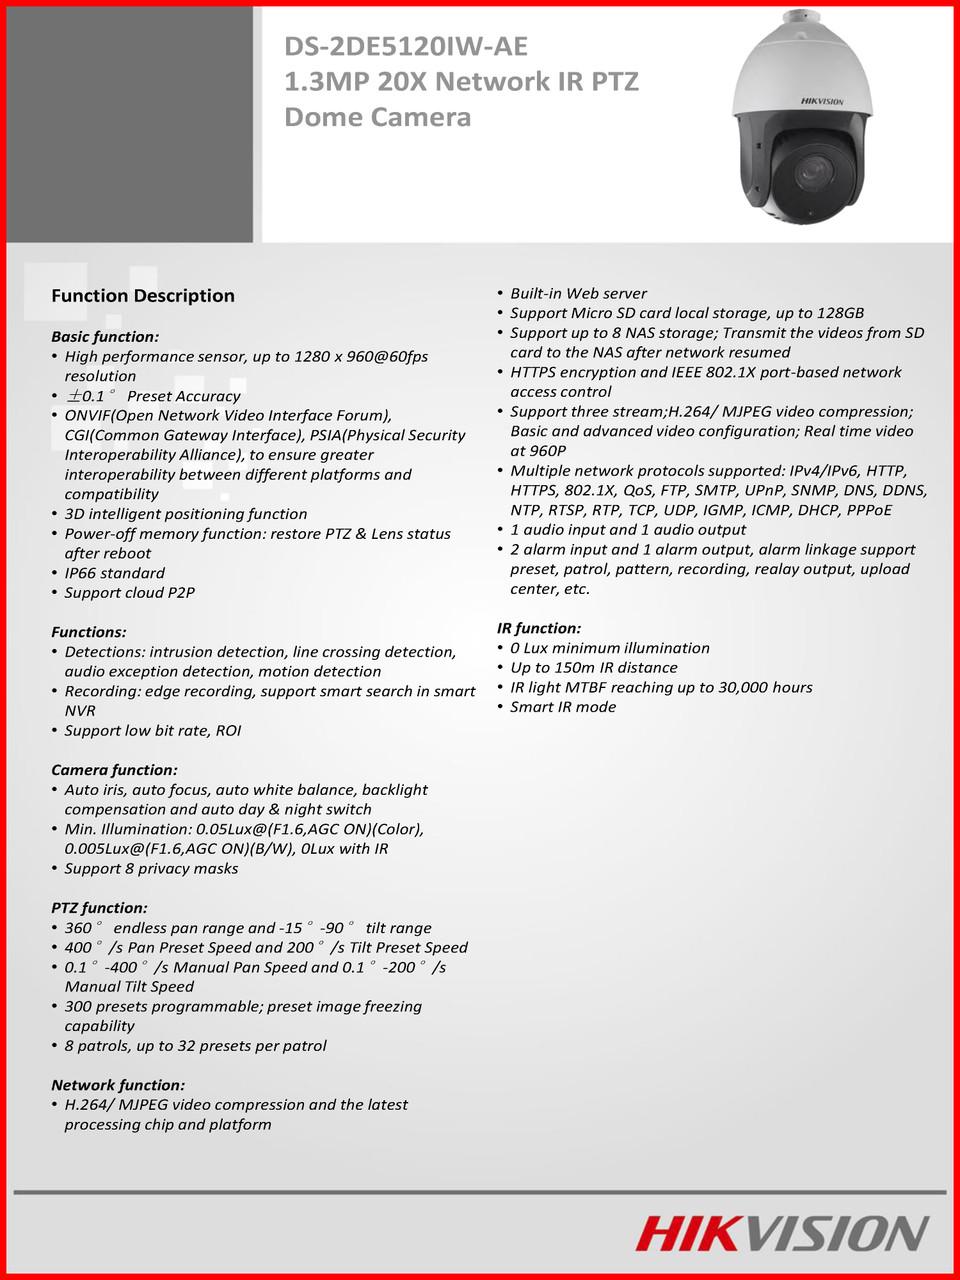 Hikvision DS-2DE5120IW-AE 1 3MP 20X Network IR PTZ Dome Camera